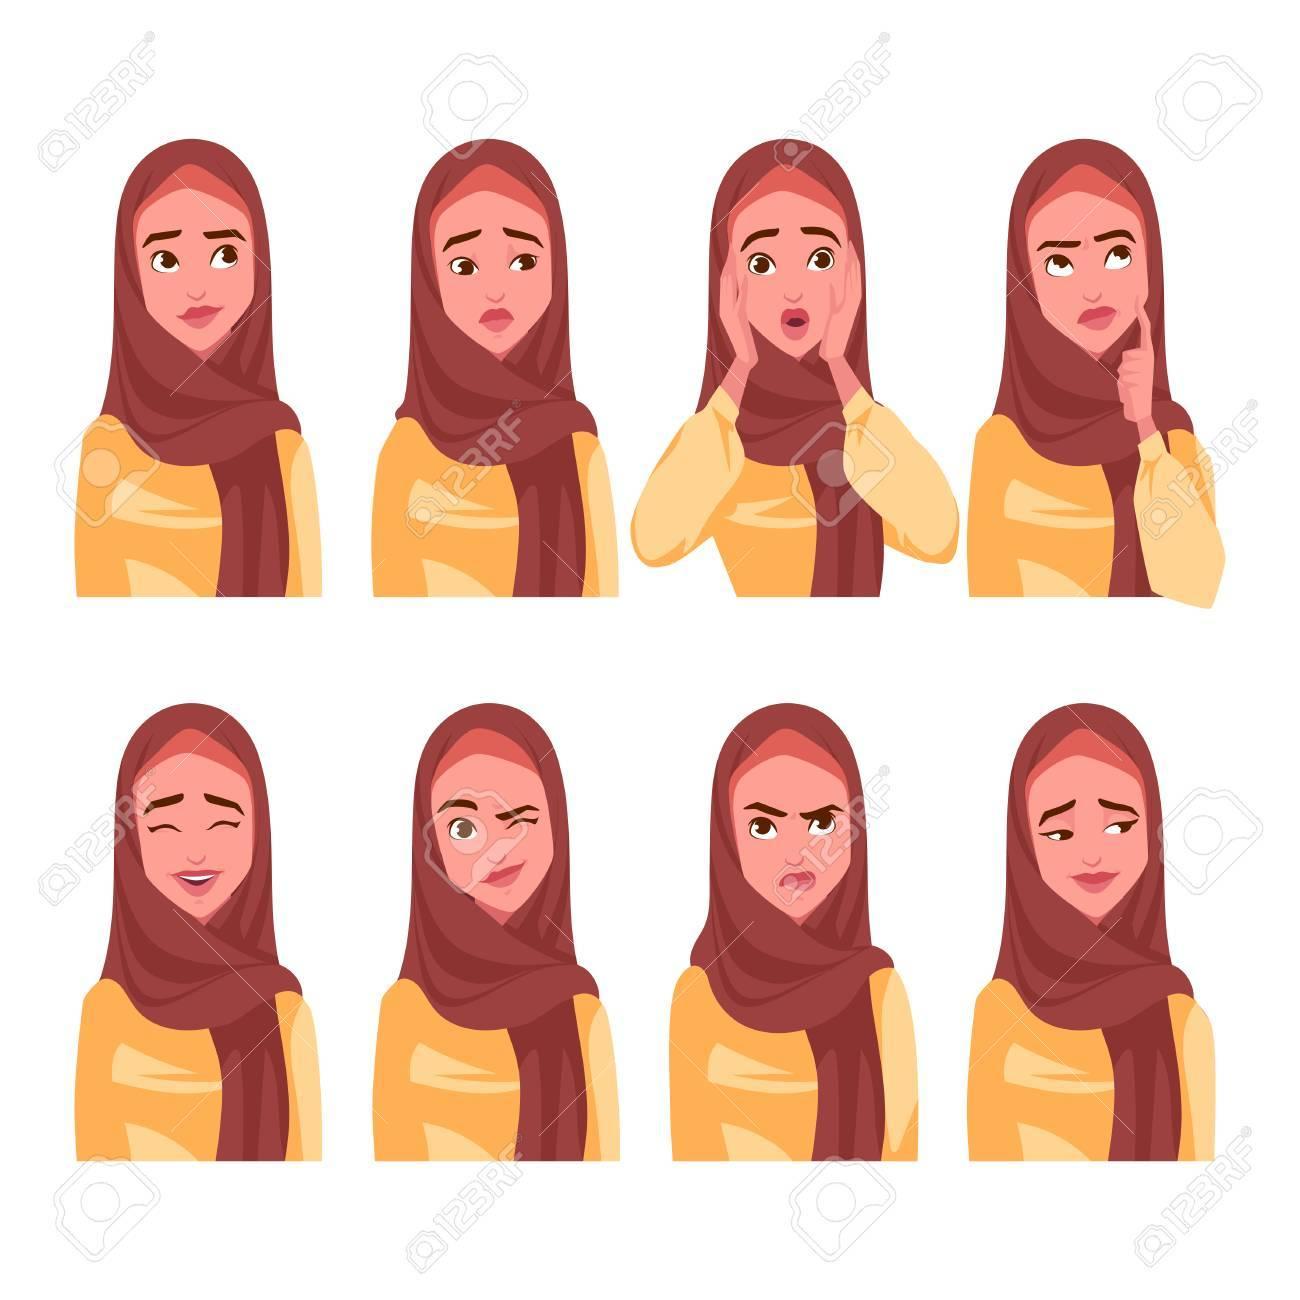 Set of Muslim woman's emotions. Vector cartoon illustration. - 89721738